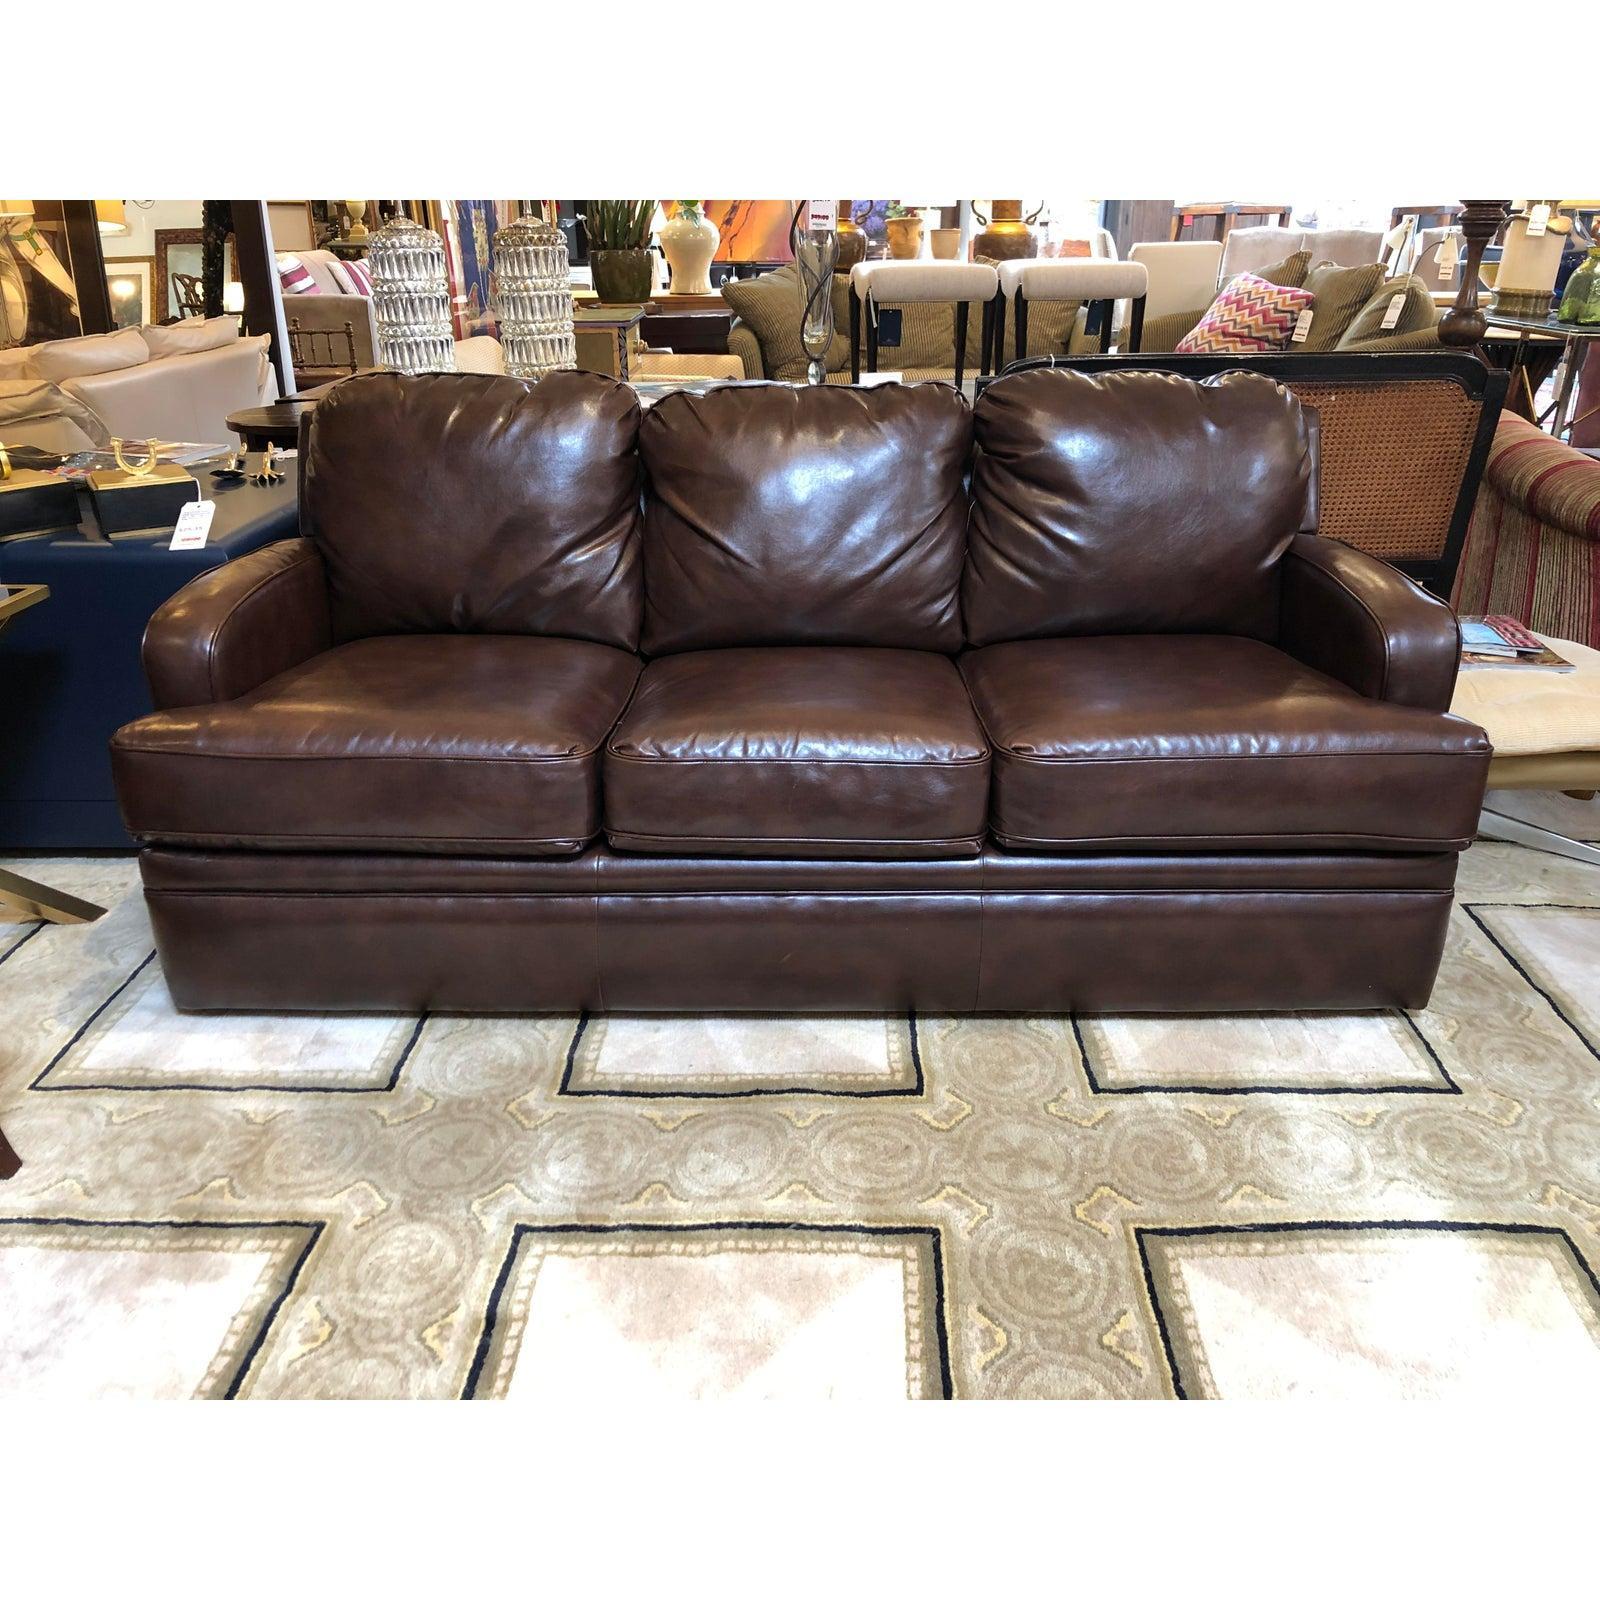 Custom Leather Sofa By Pottery Barn